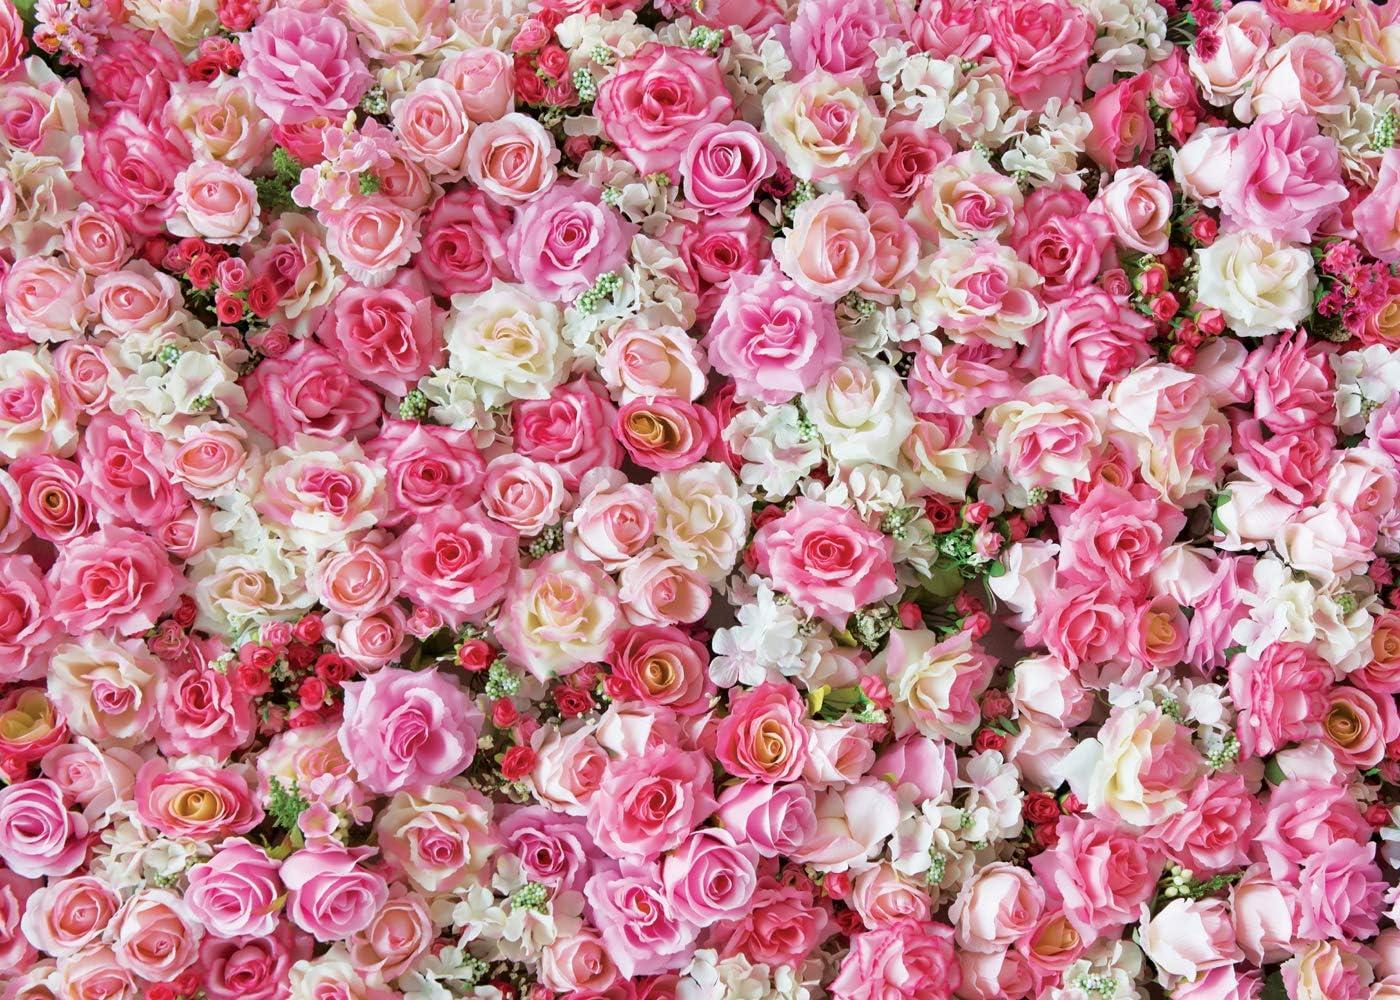 Dudaacvt 10x10ft Rose Floral Wall Wedding Photography Backdrop Vinyl Pink Flowers Wall Photo Backdrop Happy Birthday Backdrop Studio Prop D040